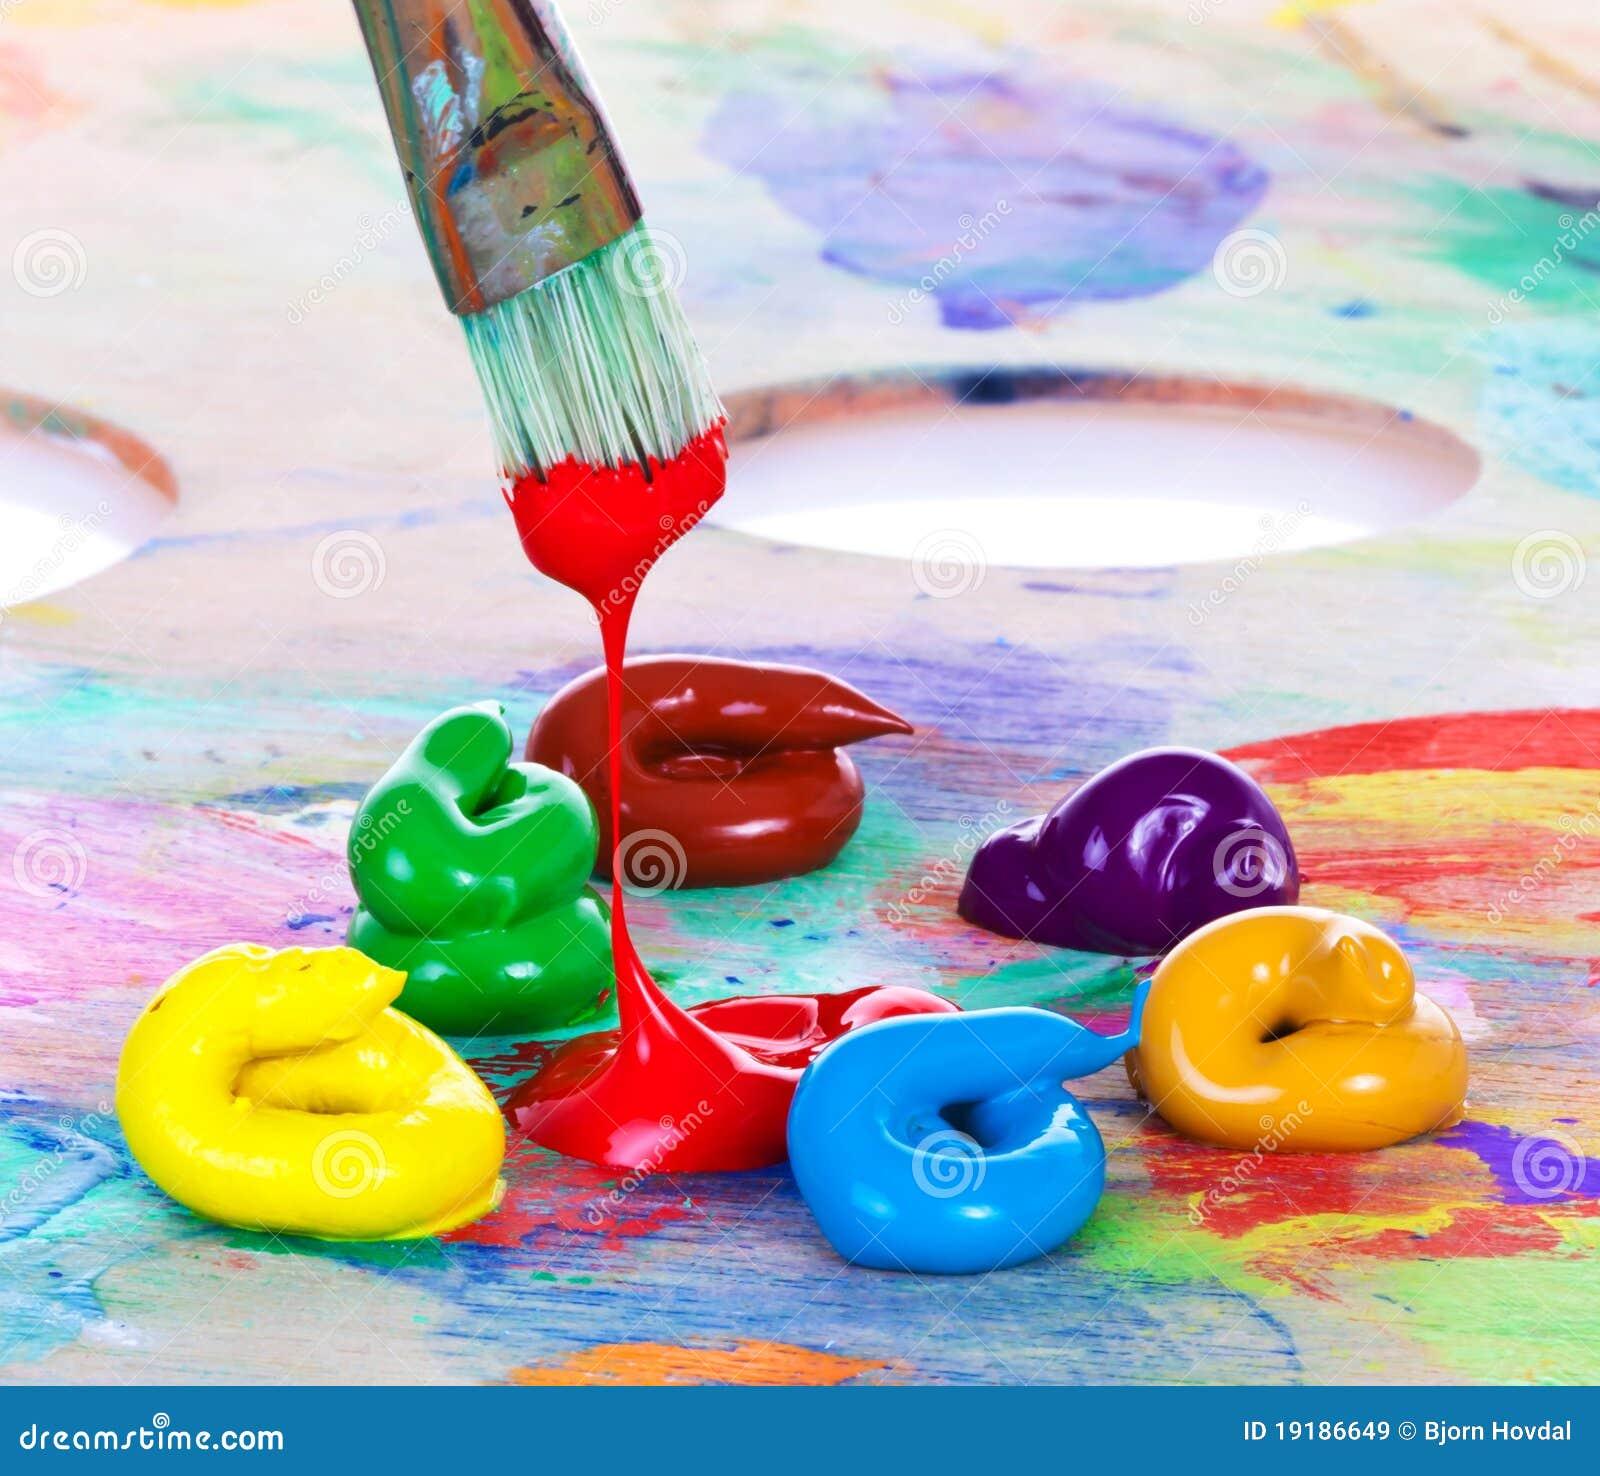 High Resolution Paint Brush Image